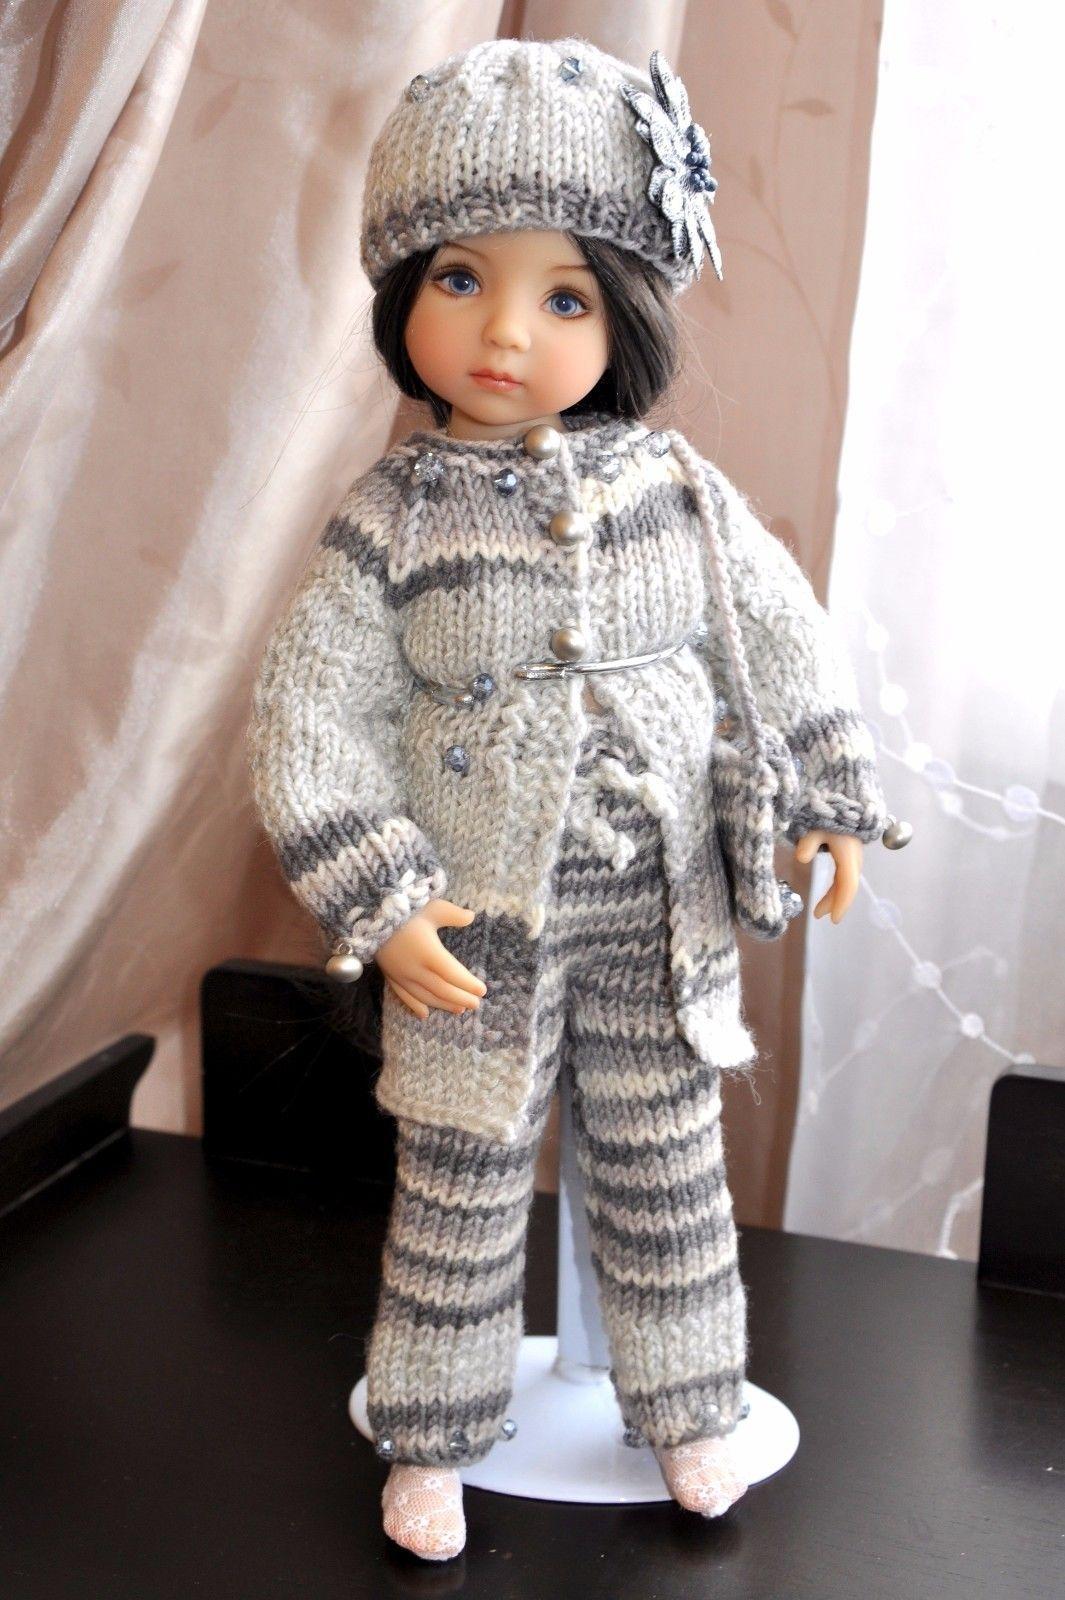 OOAK Outfit for Effner   eBay